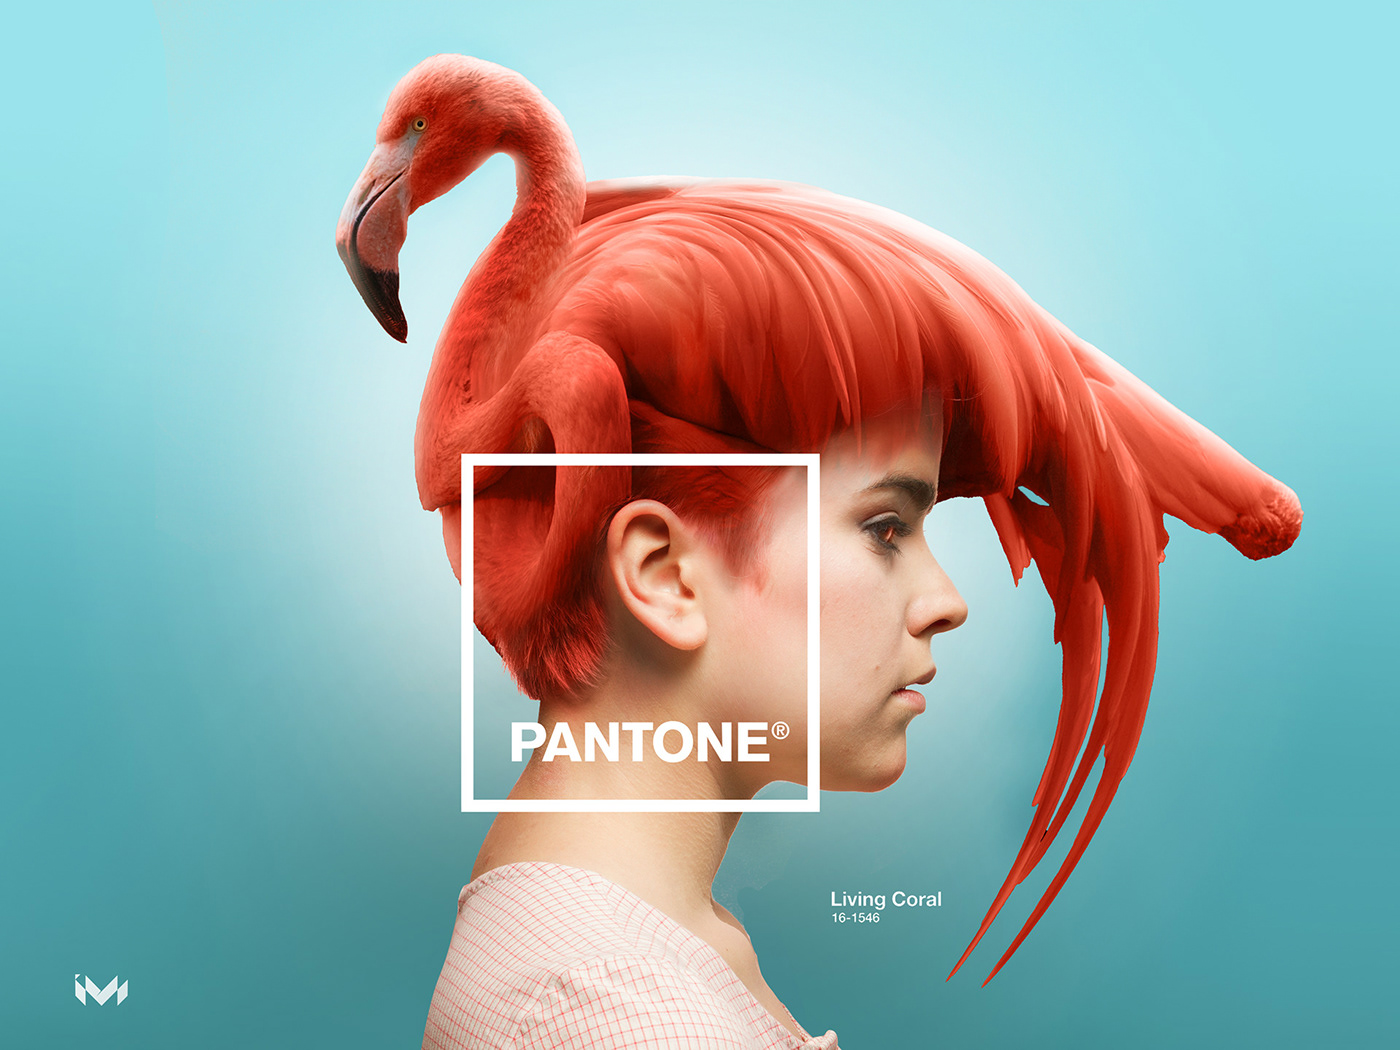 design,pantonecoloroftheyear,LivingCoral,Coloroftheyear,millennial,flamingo,ArtDirection,photoshop,composition